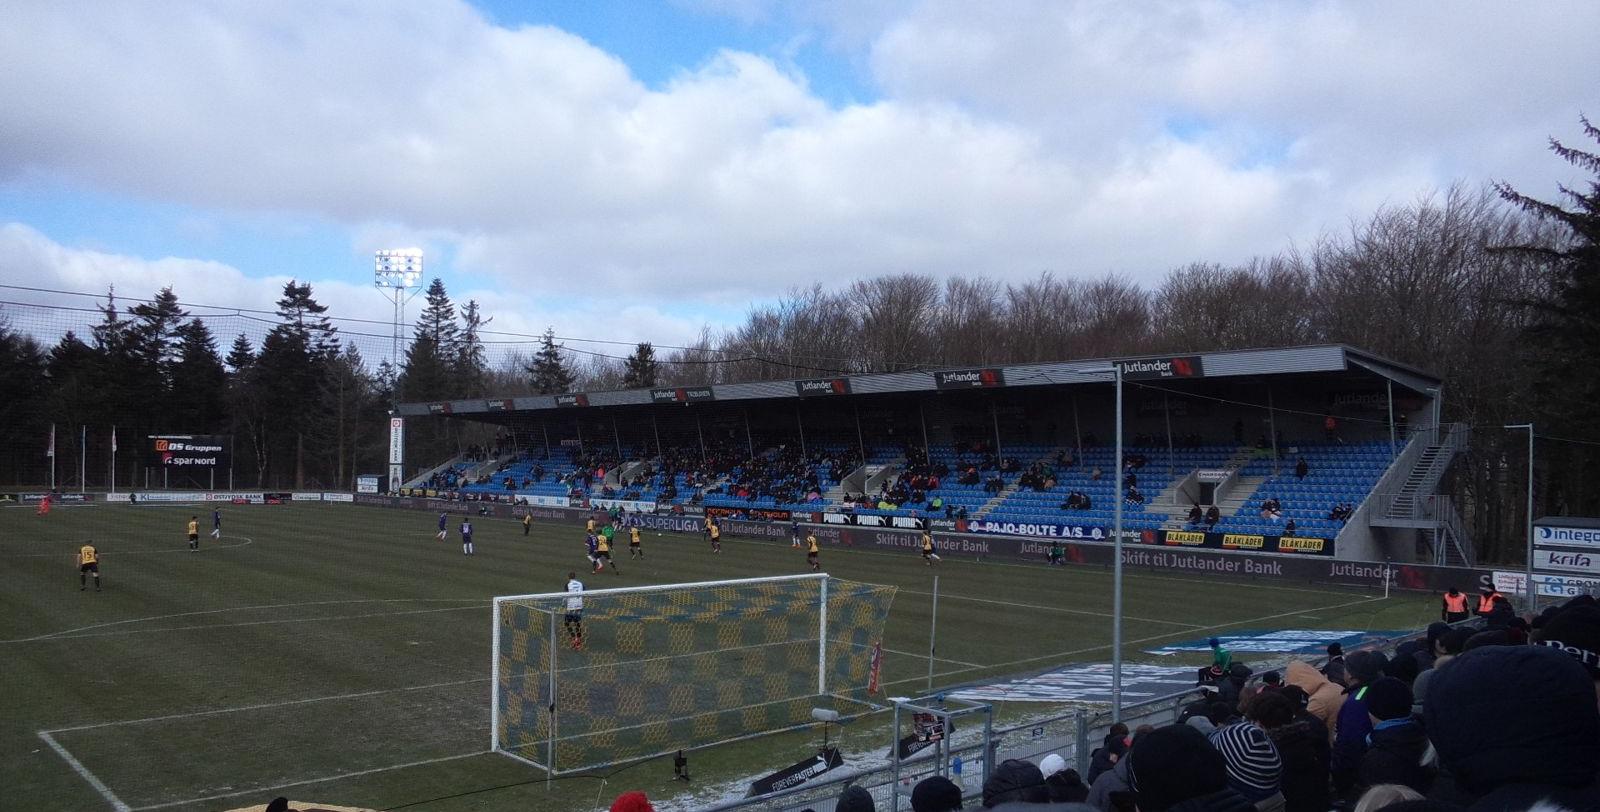 Stadion Helsingor